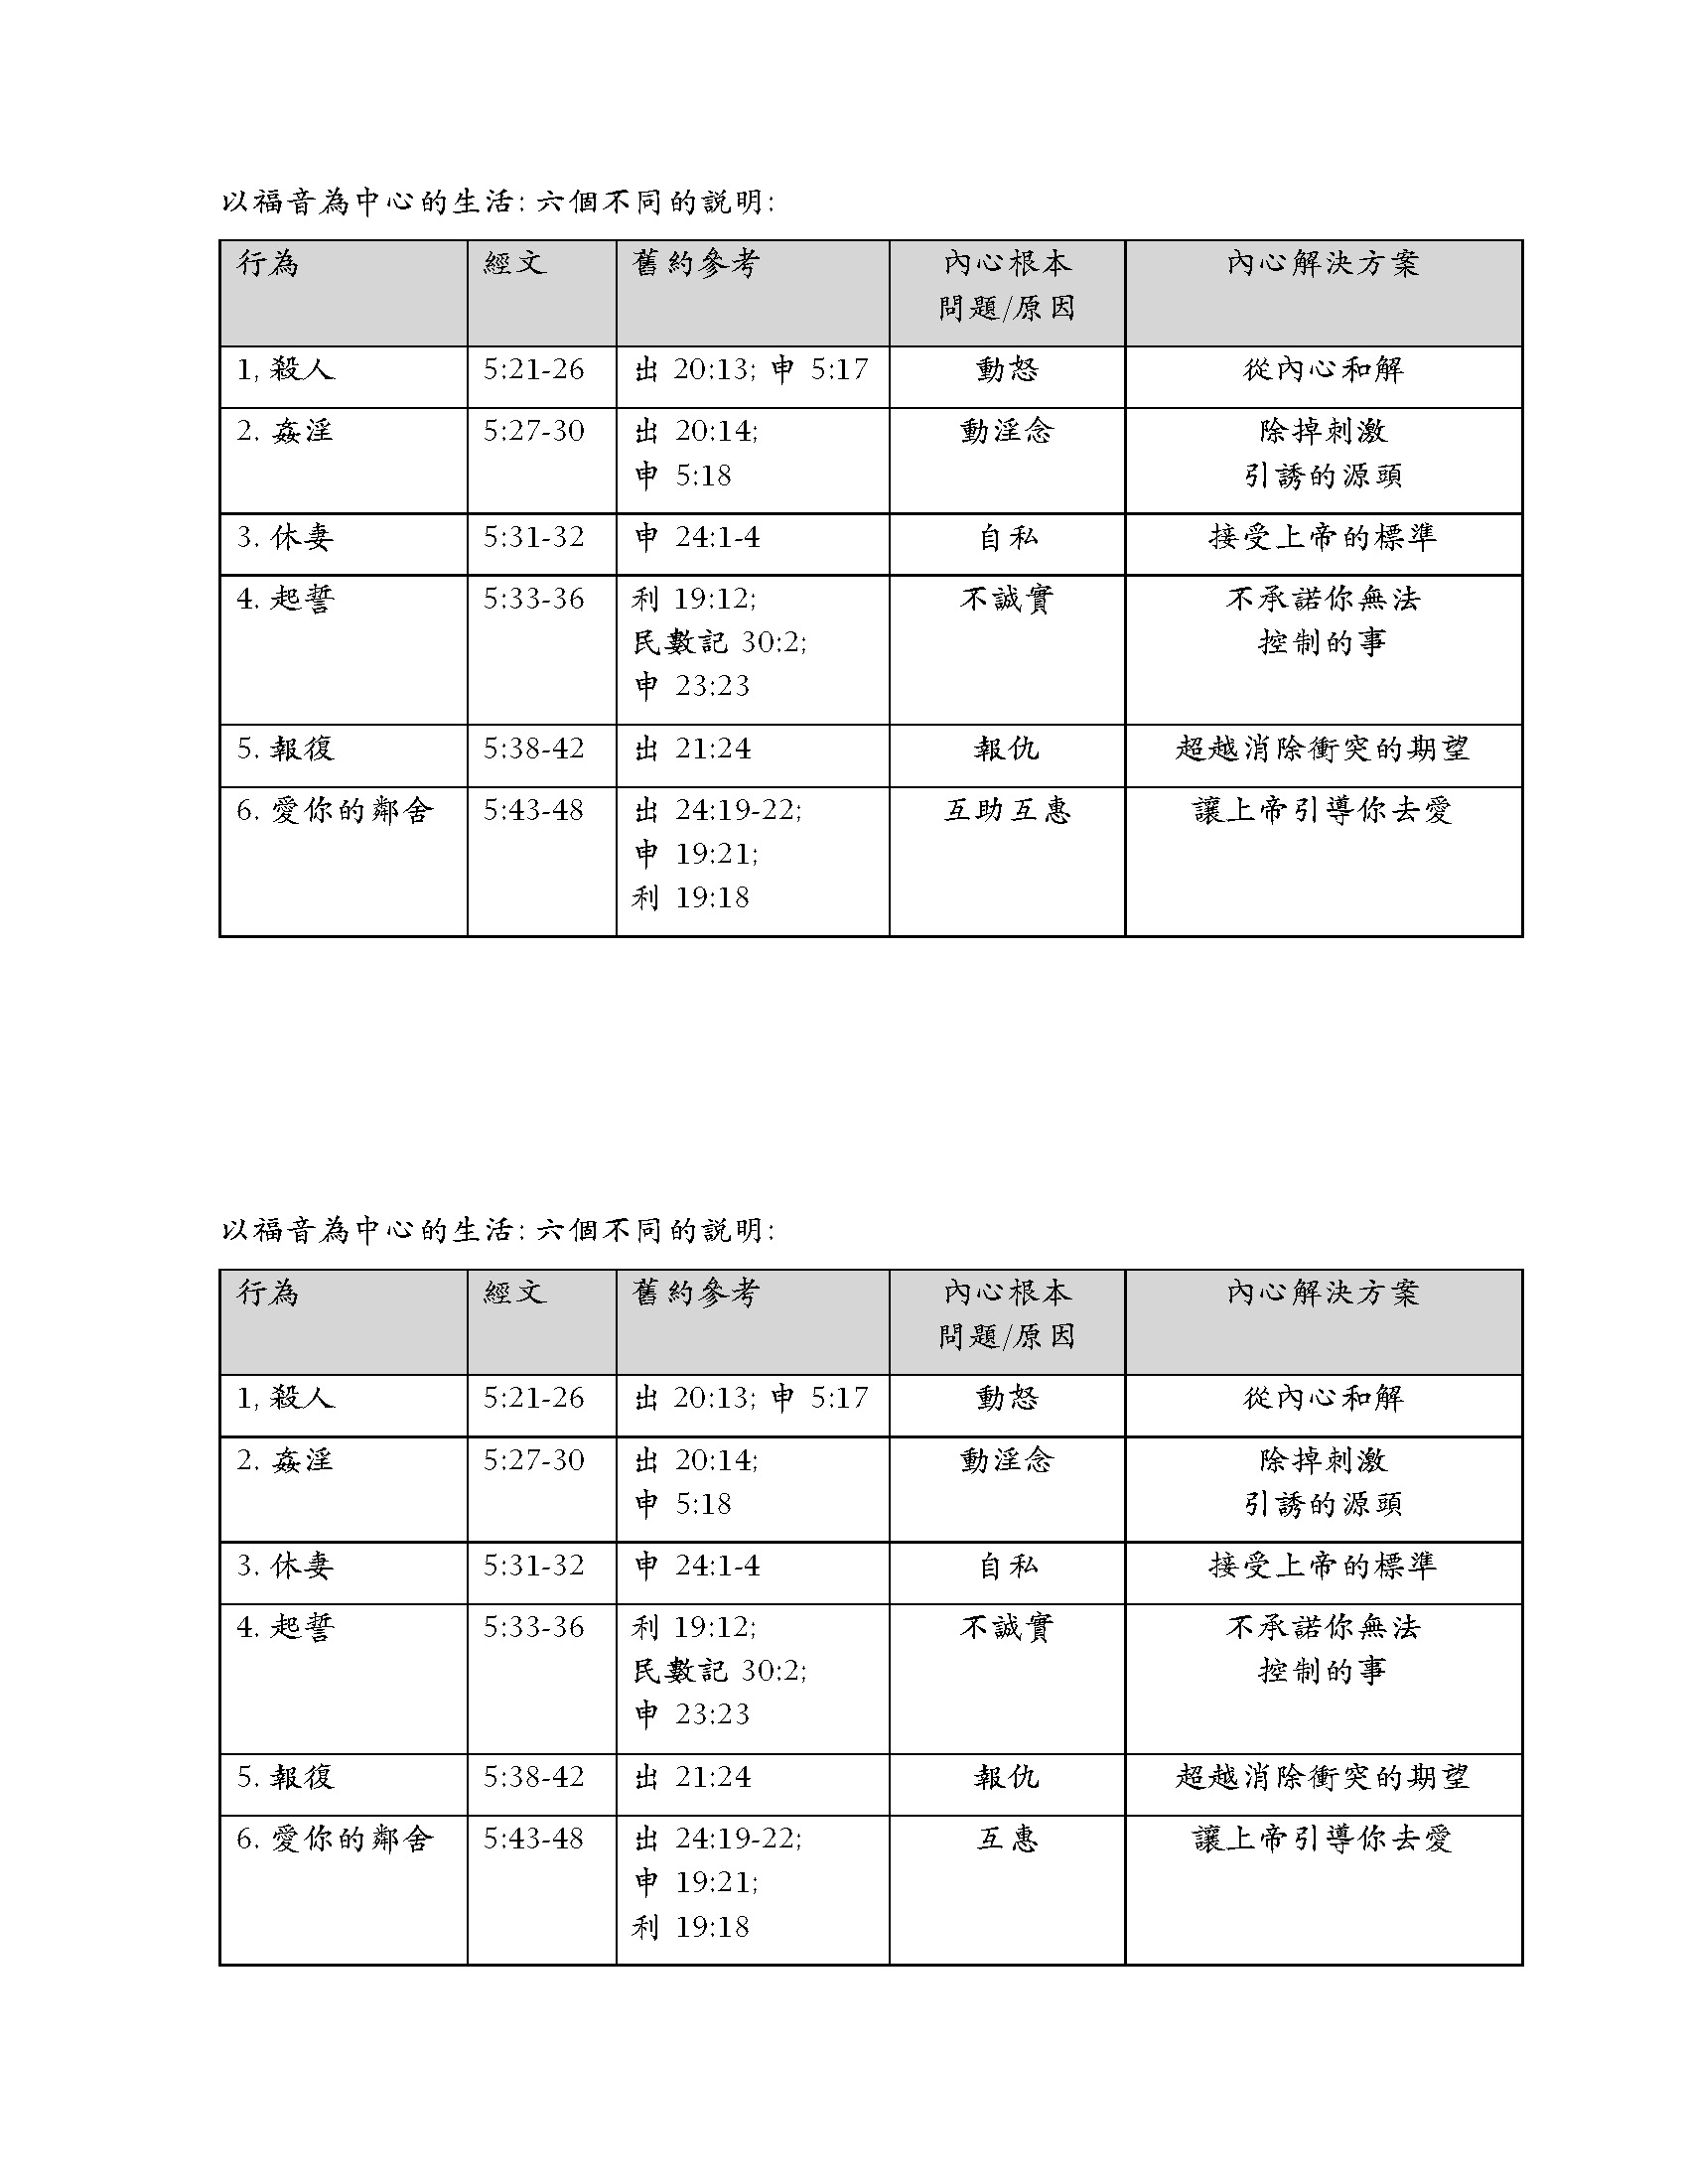 Chinese Bulletins 2.17.2019_Page_4.jpg